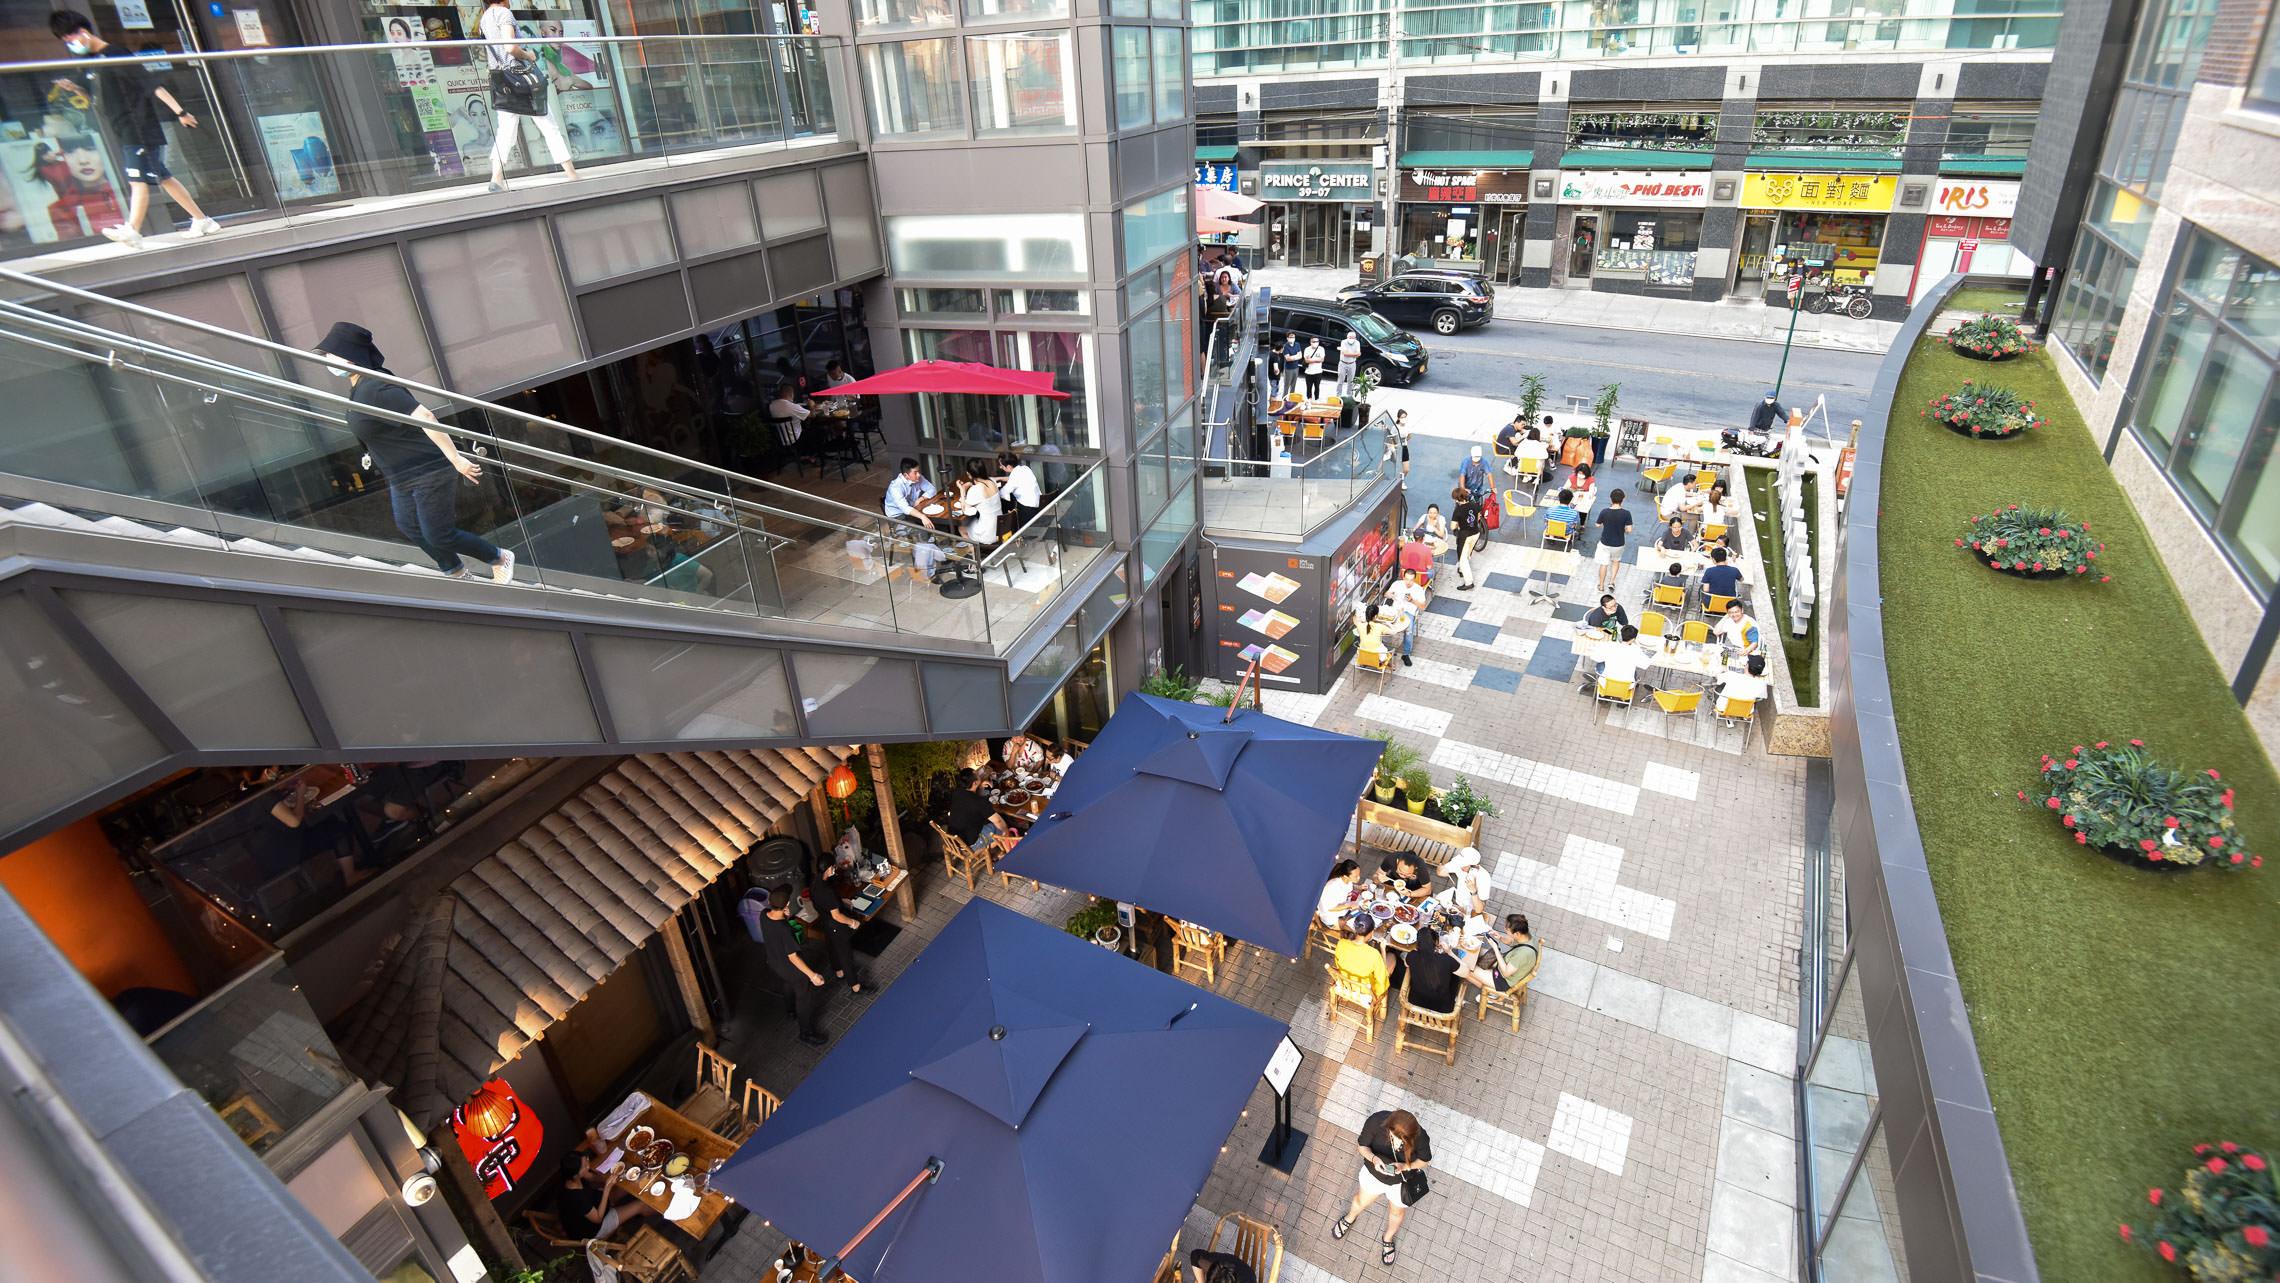 Overlooking outdoor area with restaurant dining